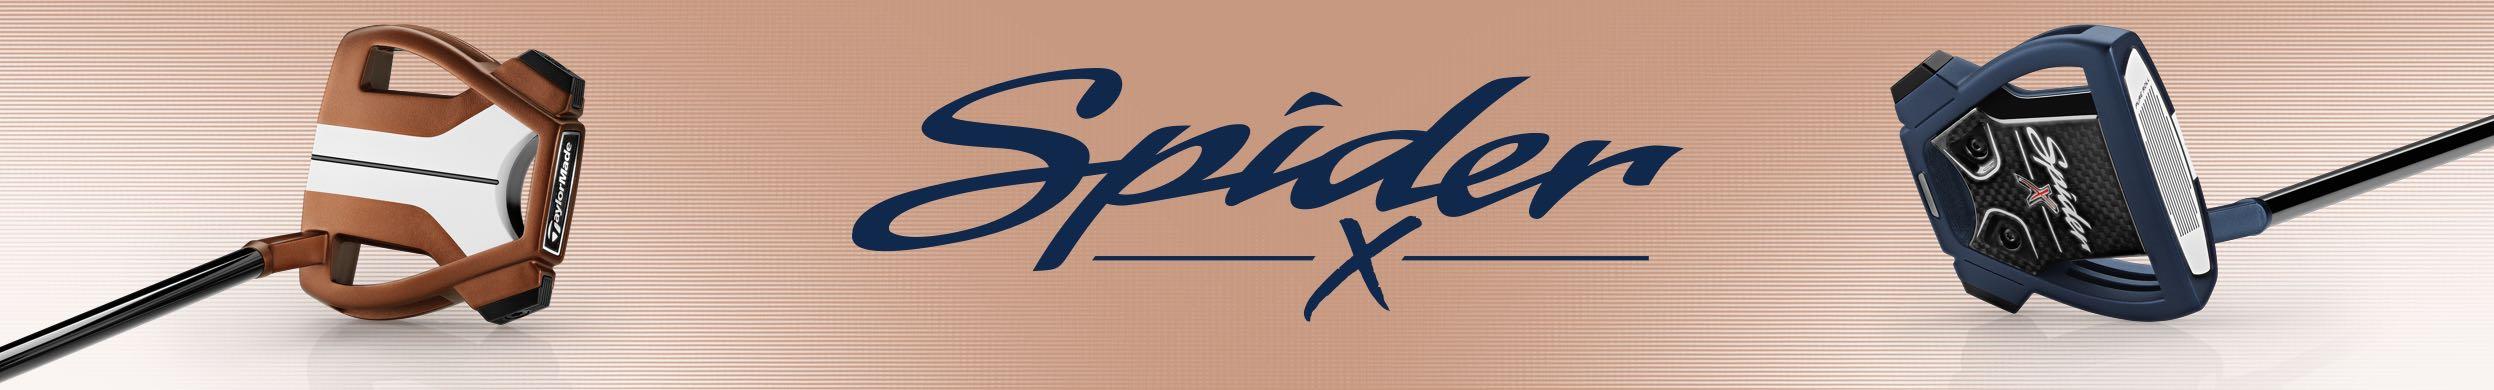 SpiderX_2x.jpg